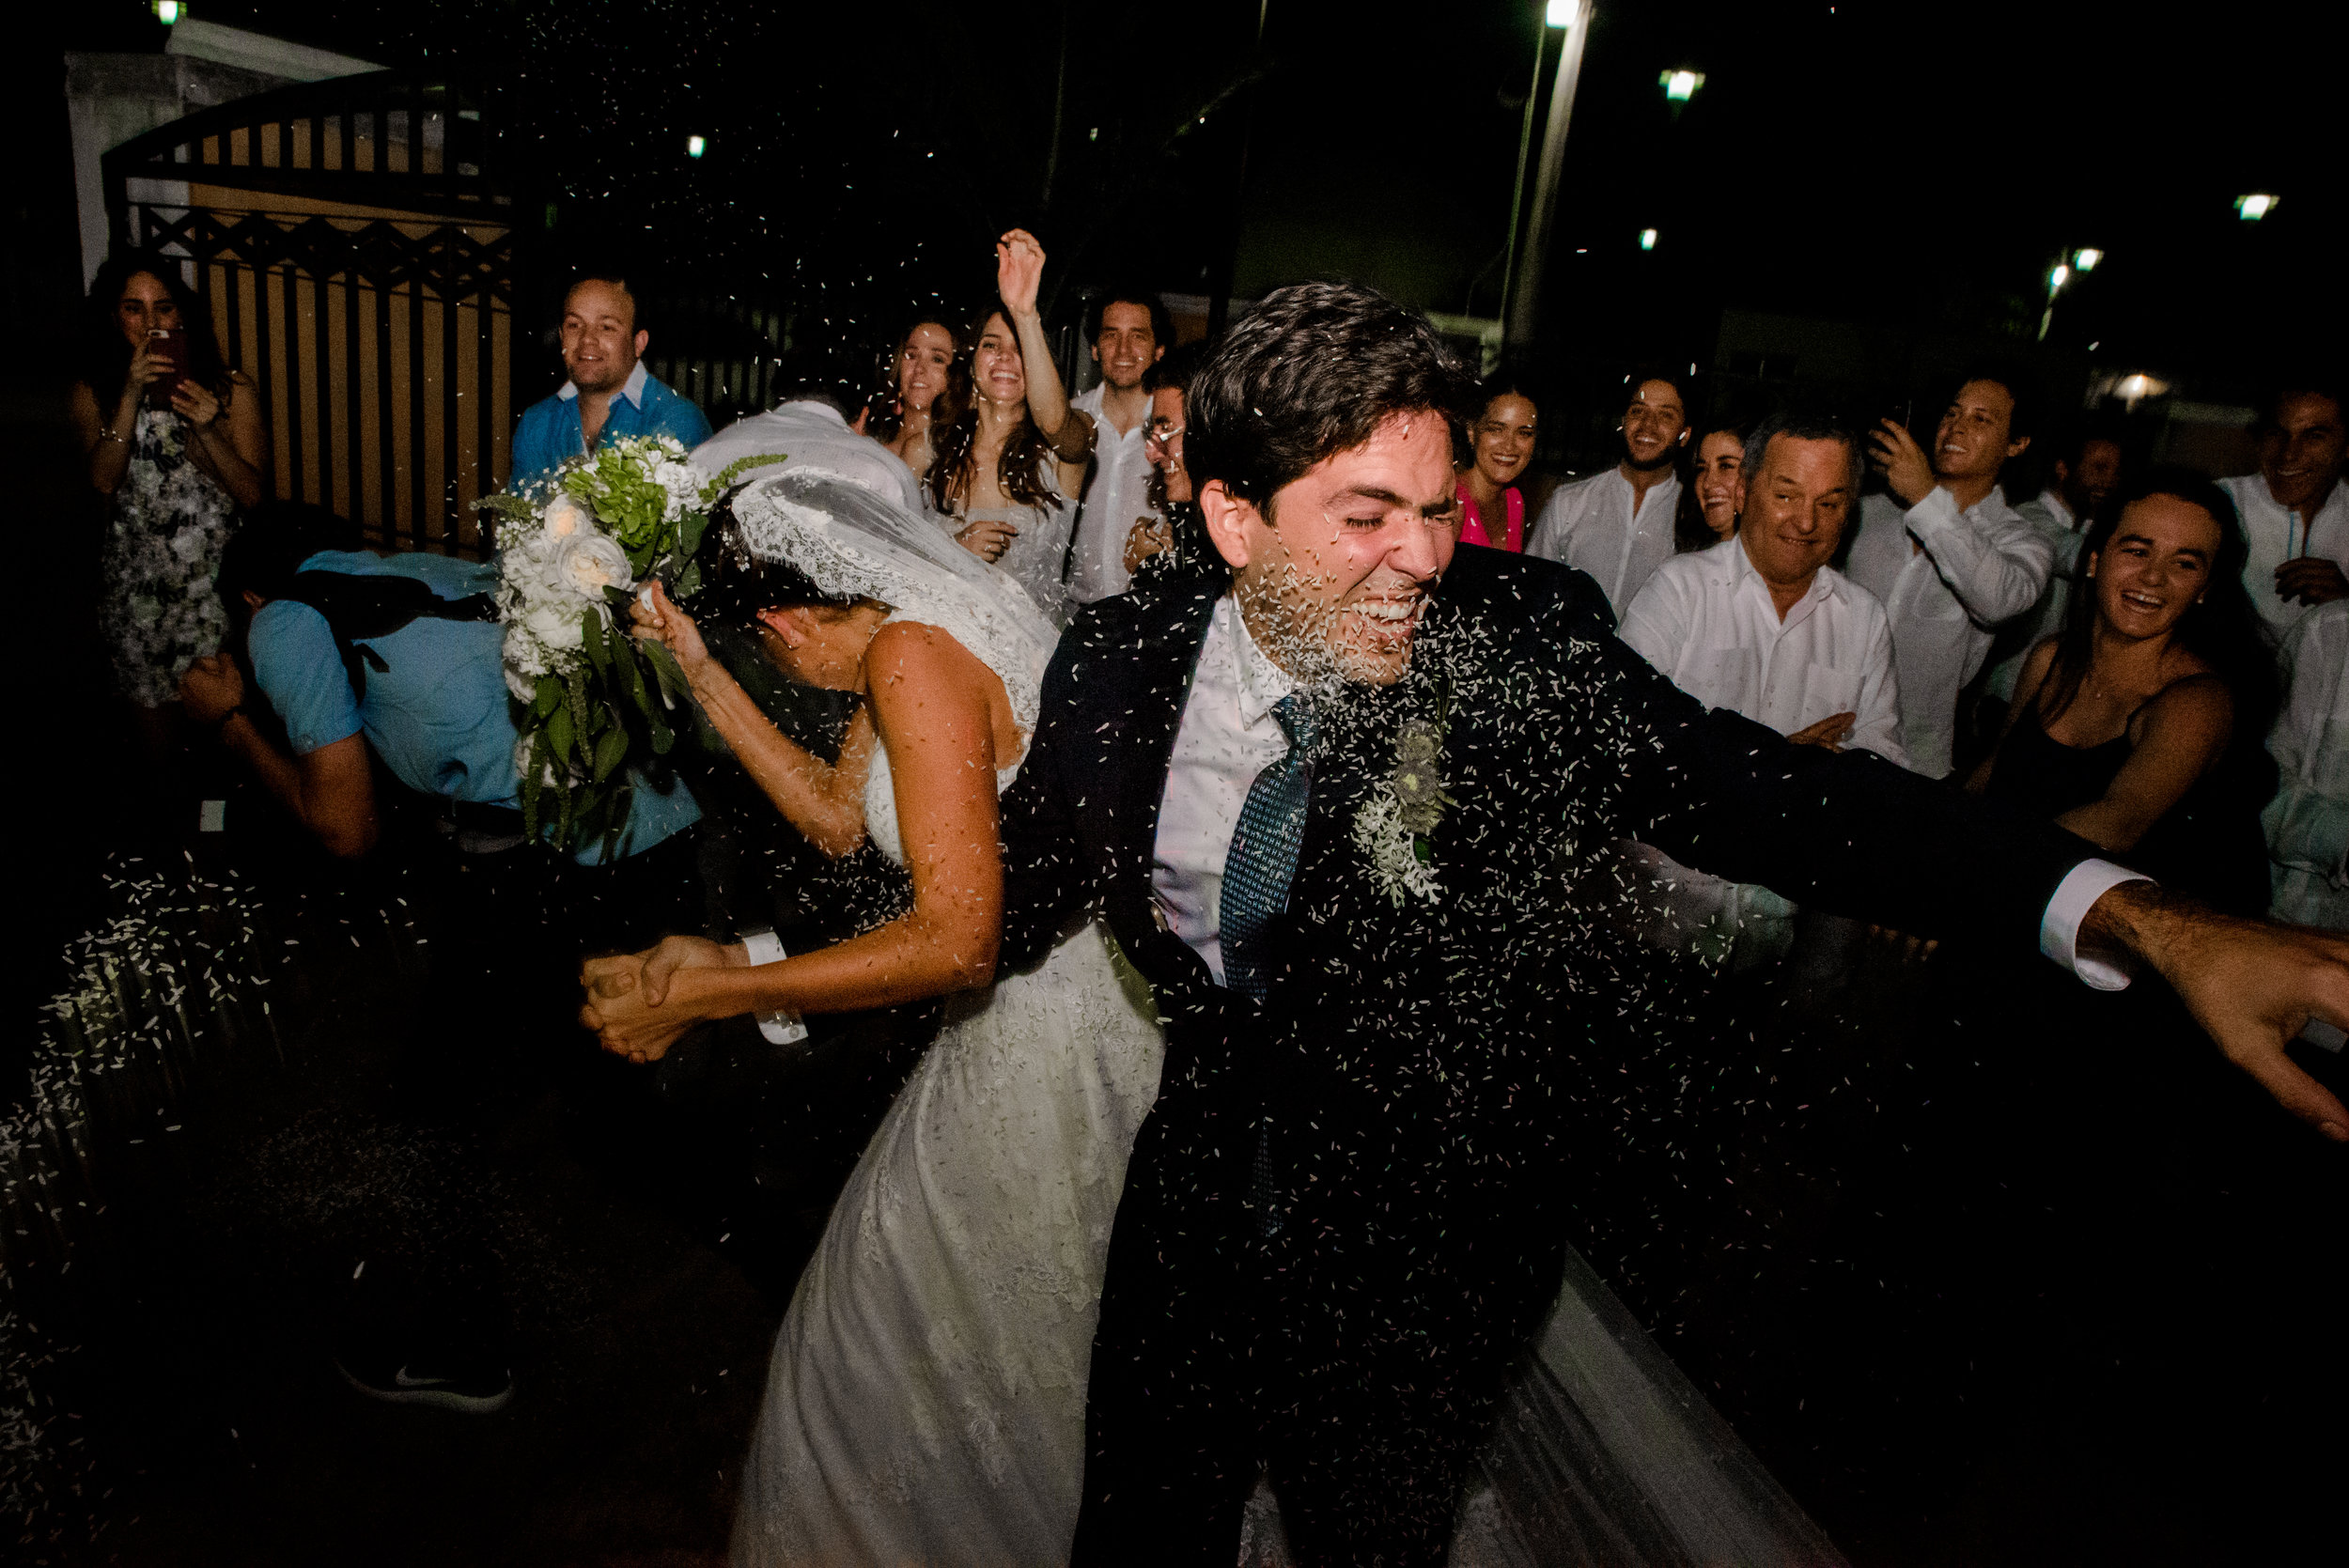 TIMETRAVEL_FOTOGRAFIA_DE_BODA_YUCATAN_DESTINATION_ALE_Y_TONO_JUST_MARRIED.JPG